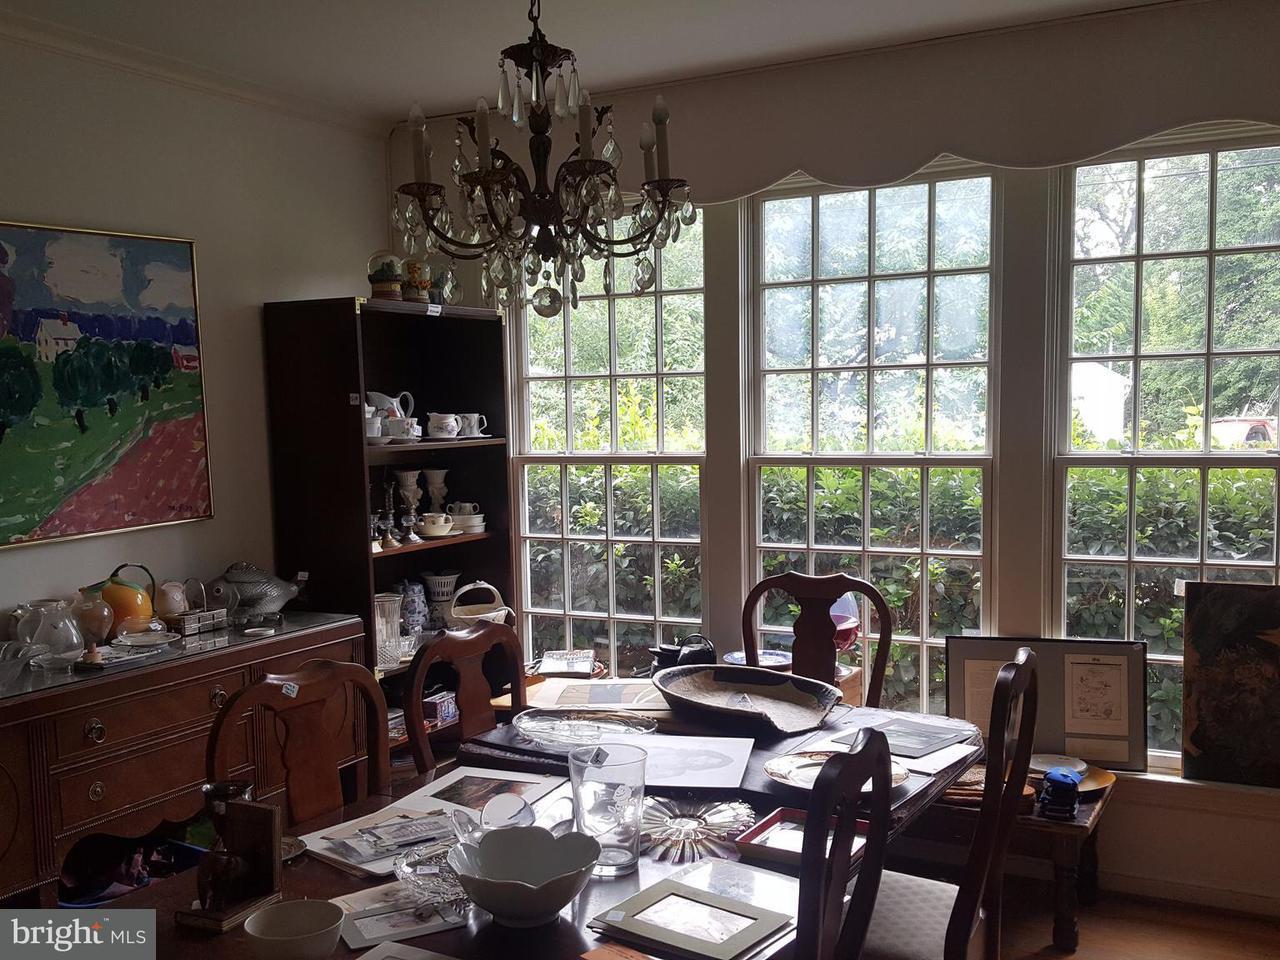 Additional photo for property listing at 2901 Garfield Ter Nw 2901 Garfield Ter Nw Washington, Distretto Di Columbia 20008 Stati Uniti